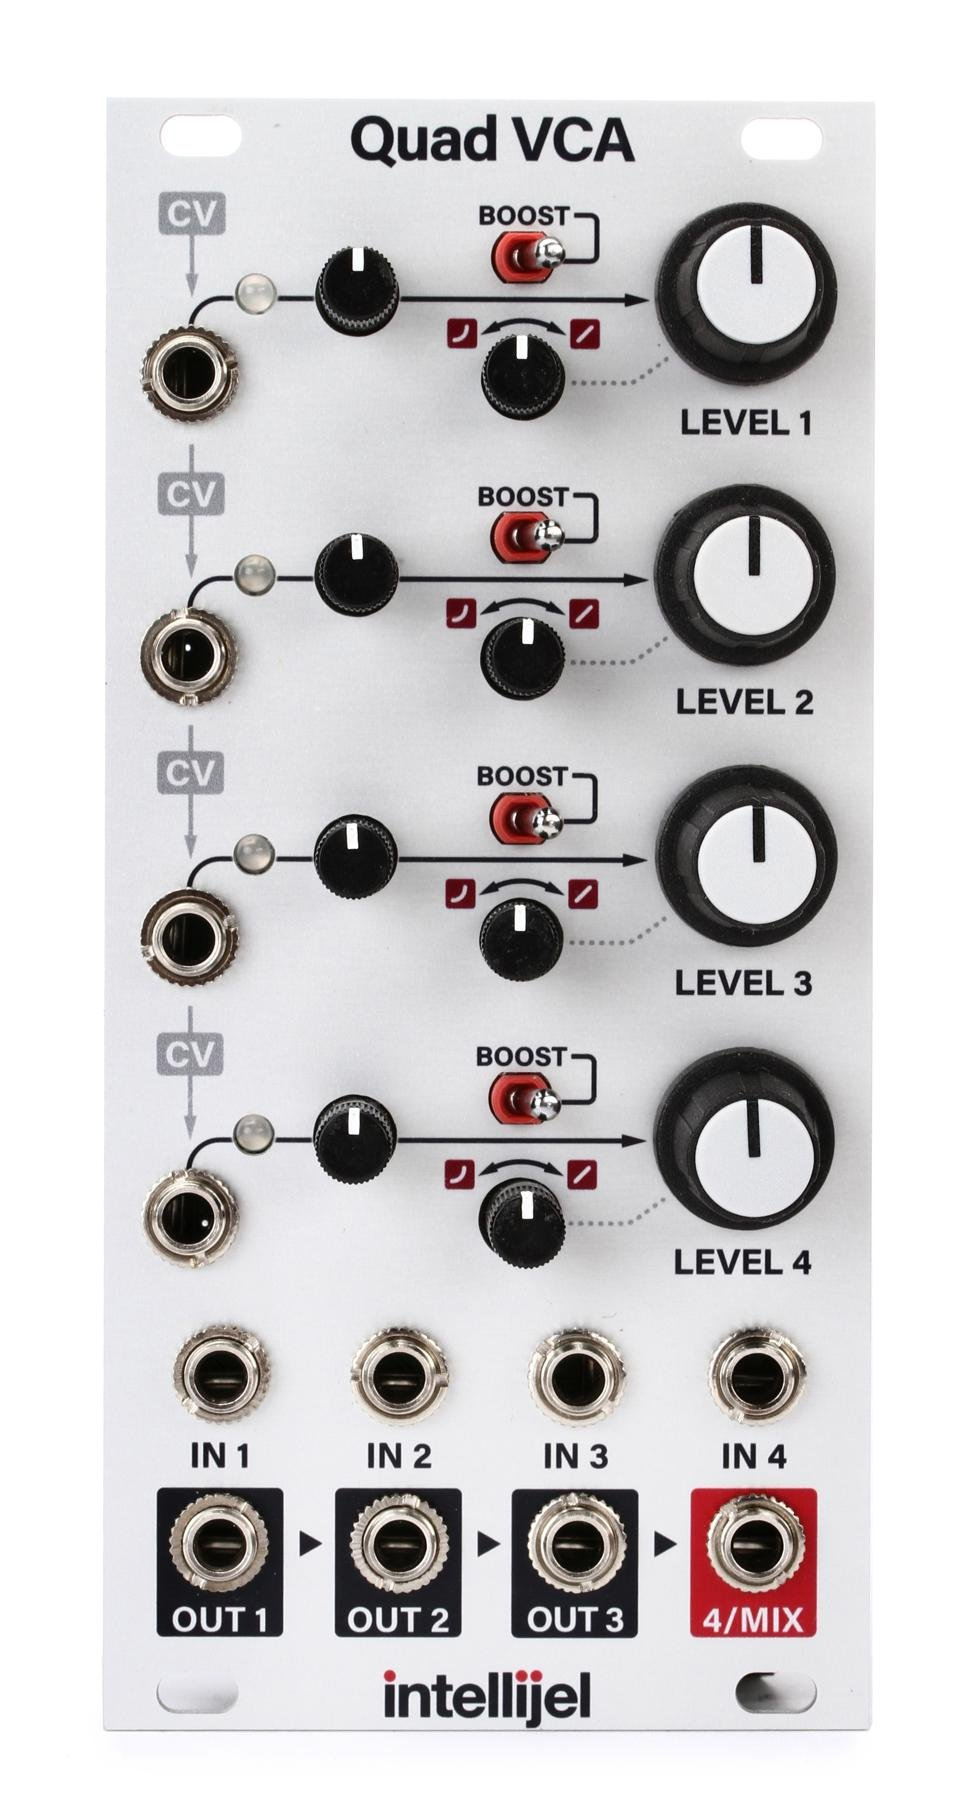 Intellijel Quad Vca Eurorack Amplifier And Cascaded Mixer Module Sweetwater